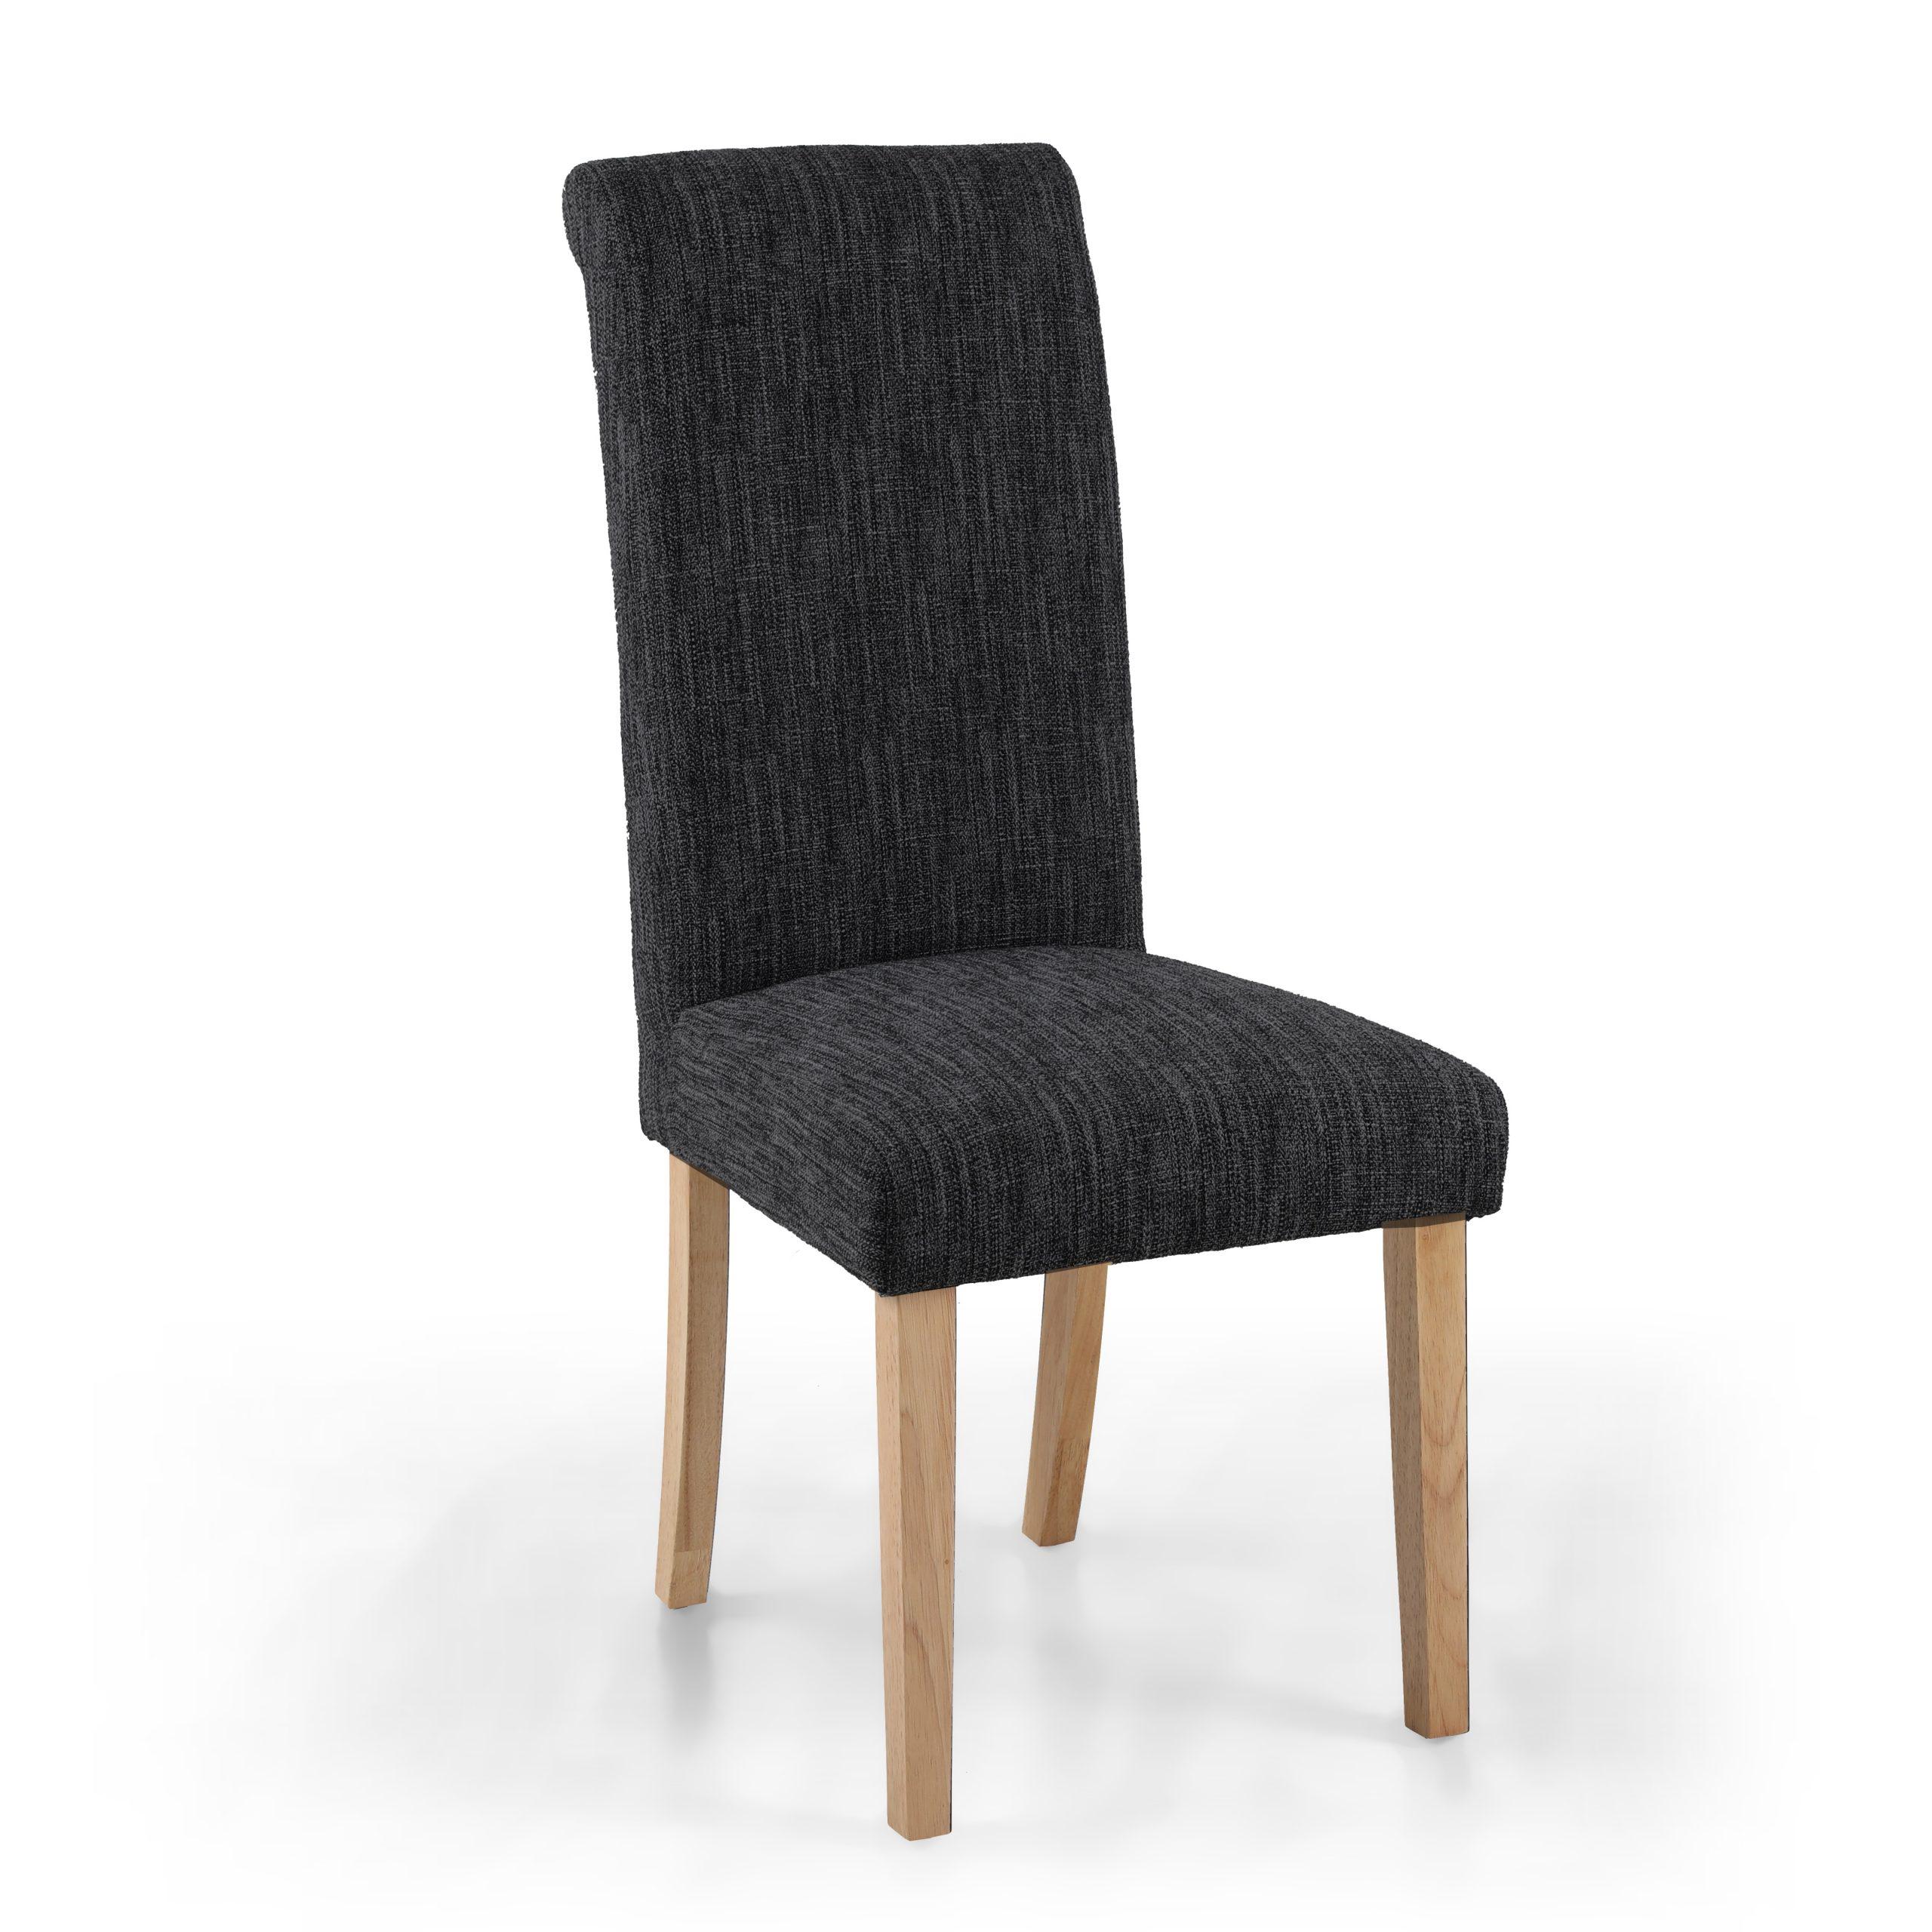 Bexley Dark Grey Linen Dining Chair